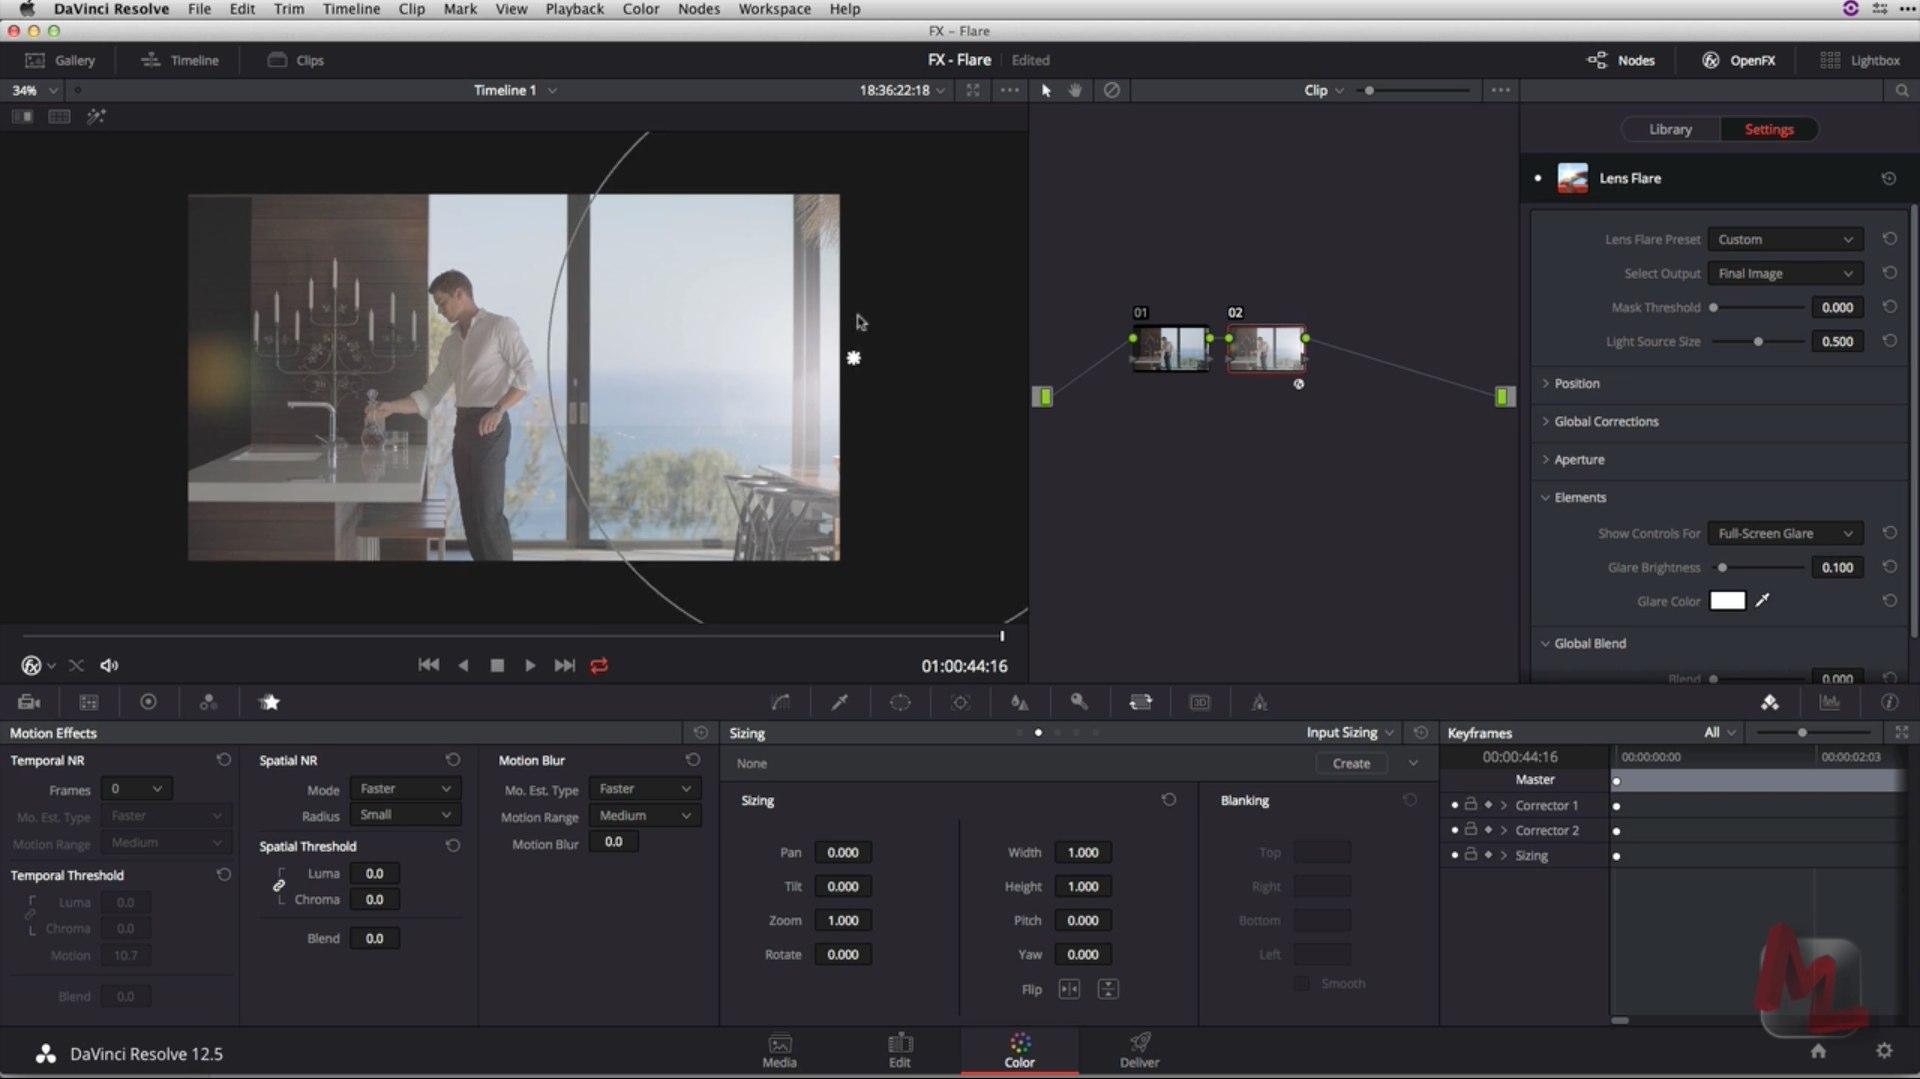 ResolveFX Lens Flare tutorials